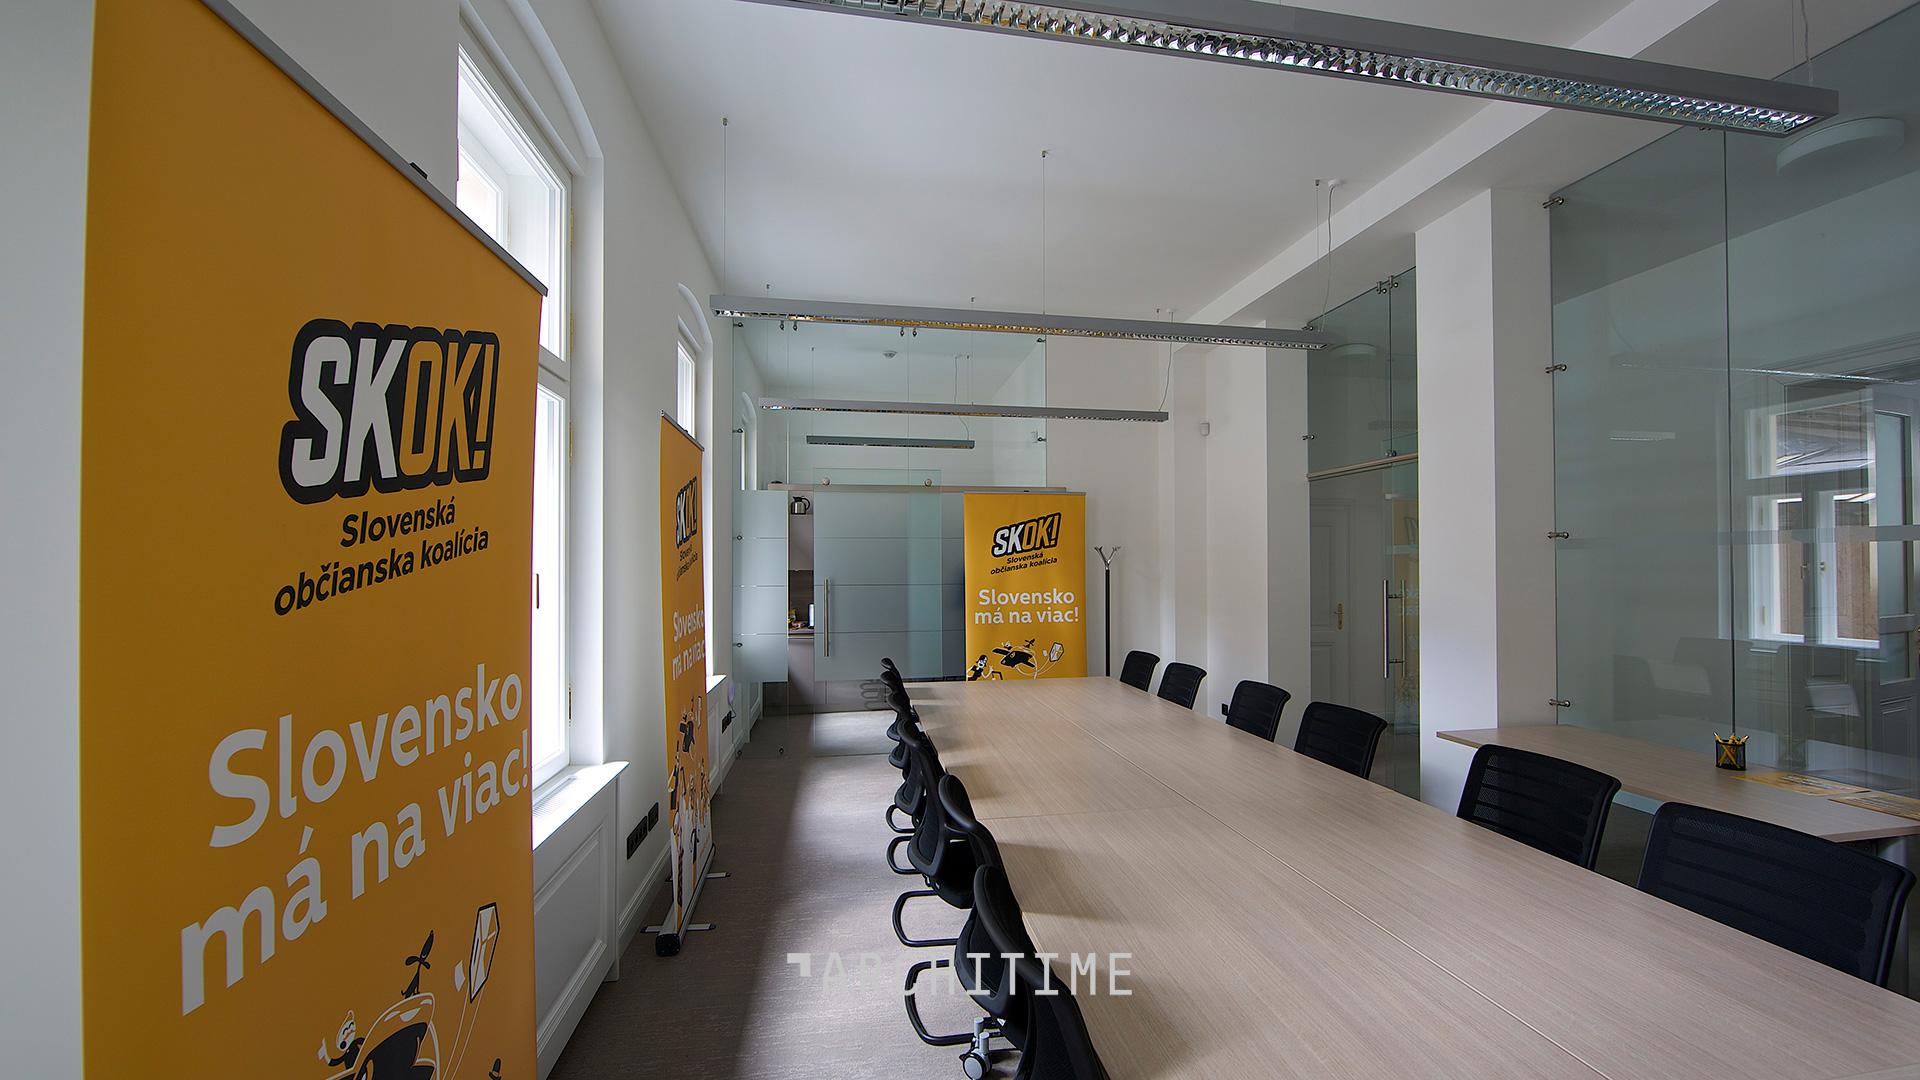 Skok – Bratislava